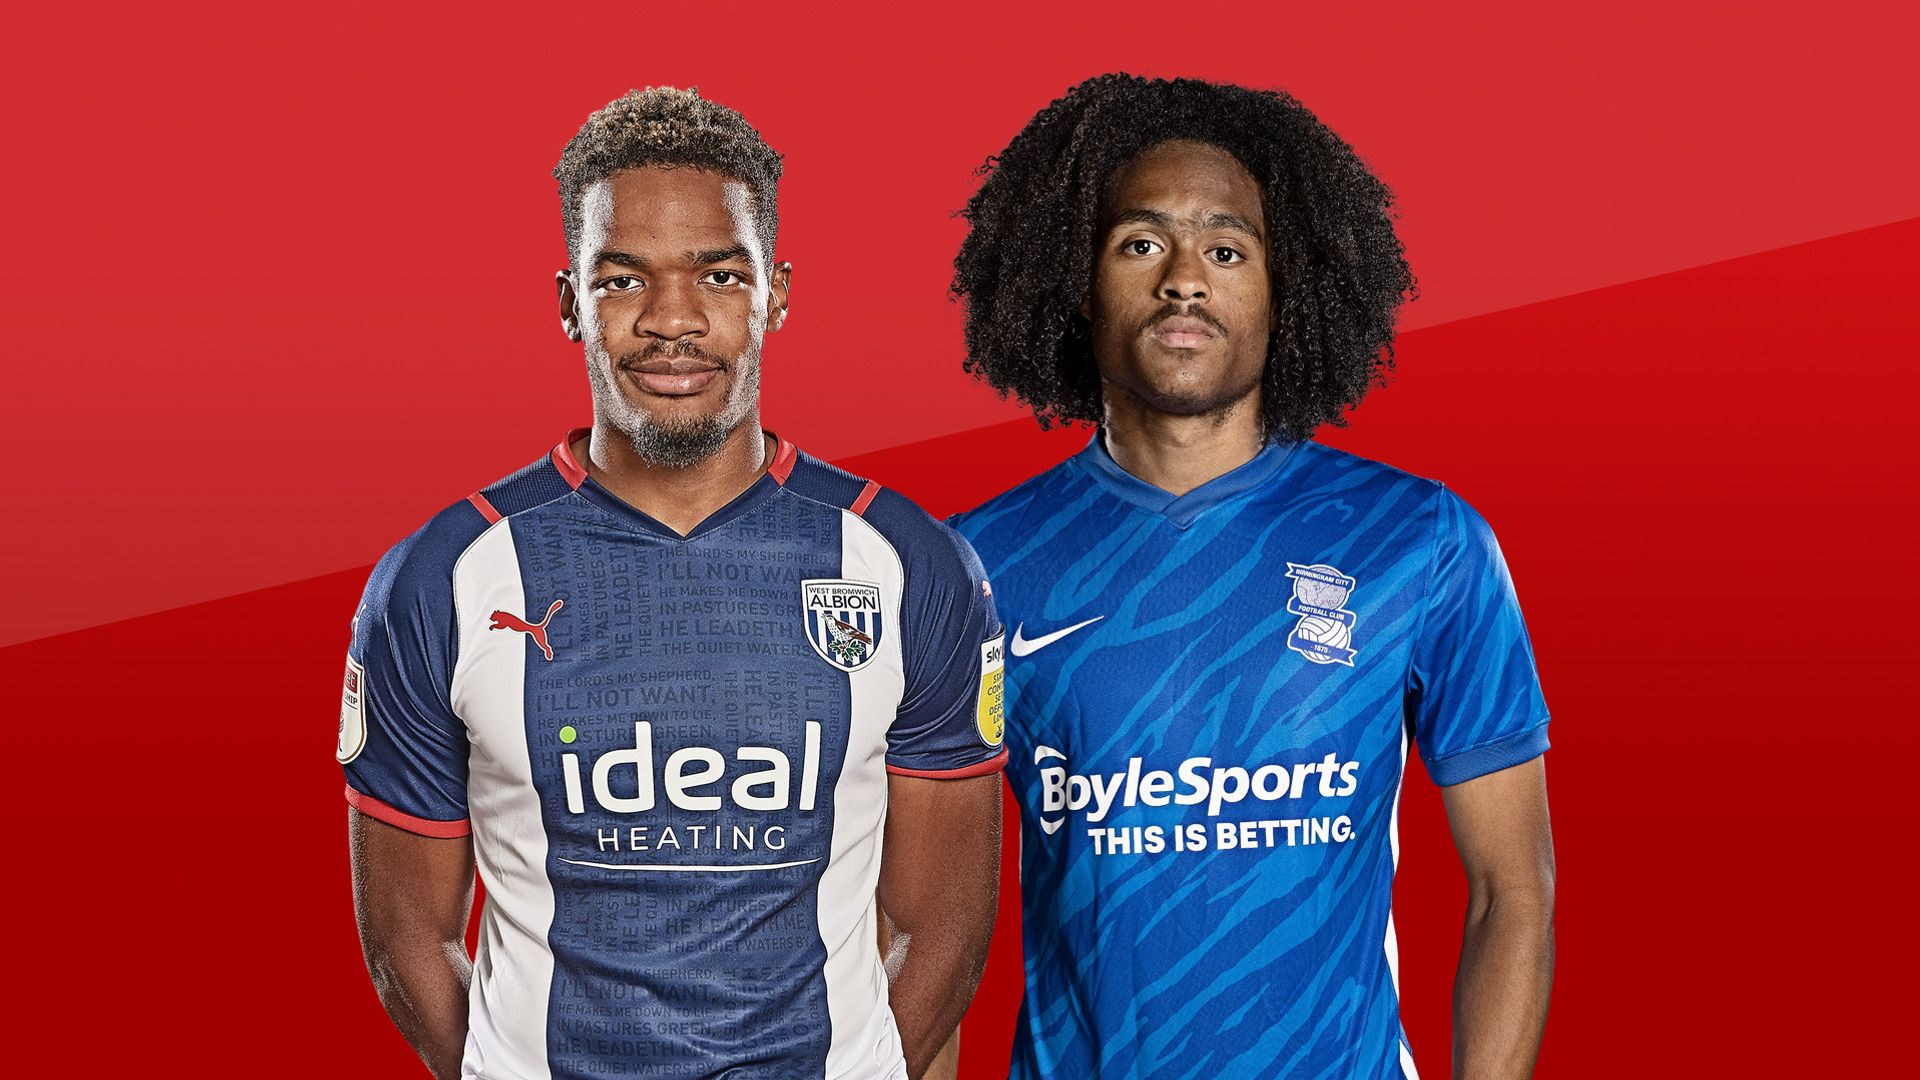 Live on Sky: West Brom vs Birmingham